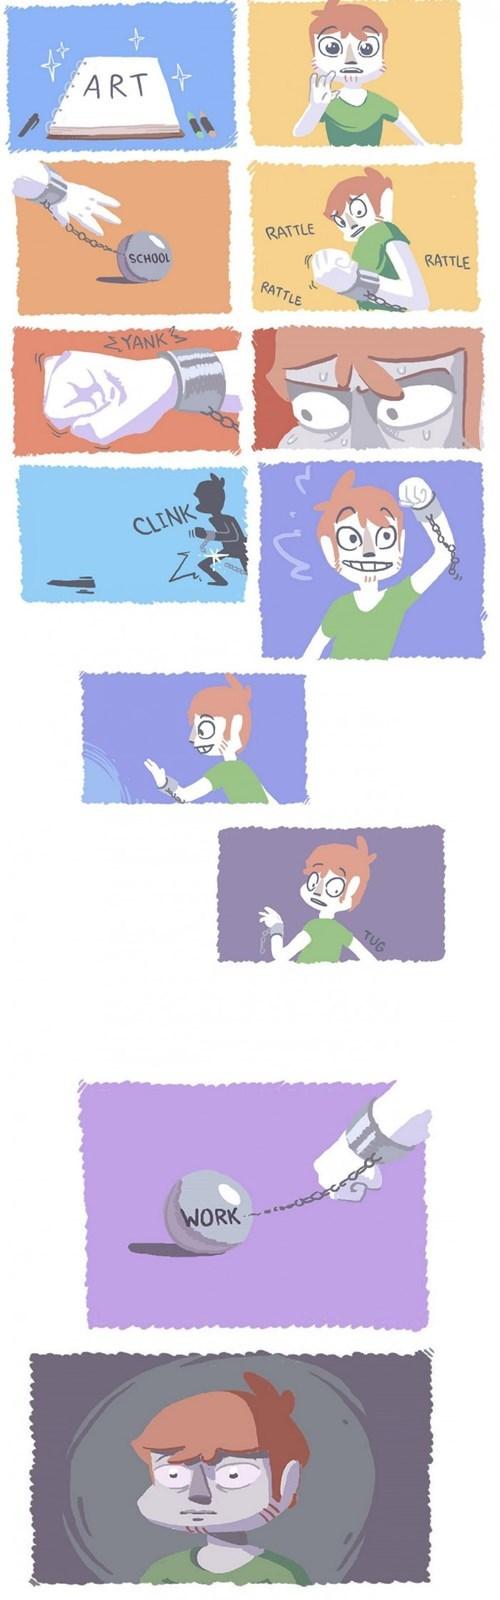 school art web comics